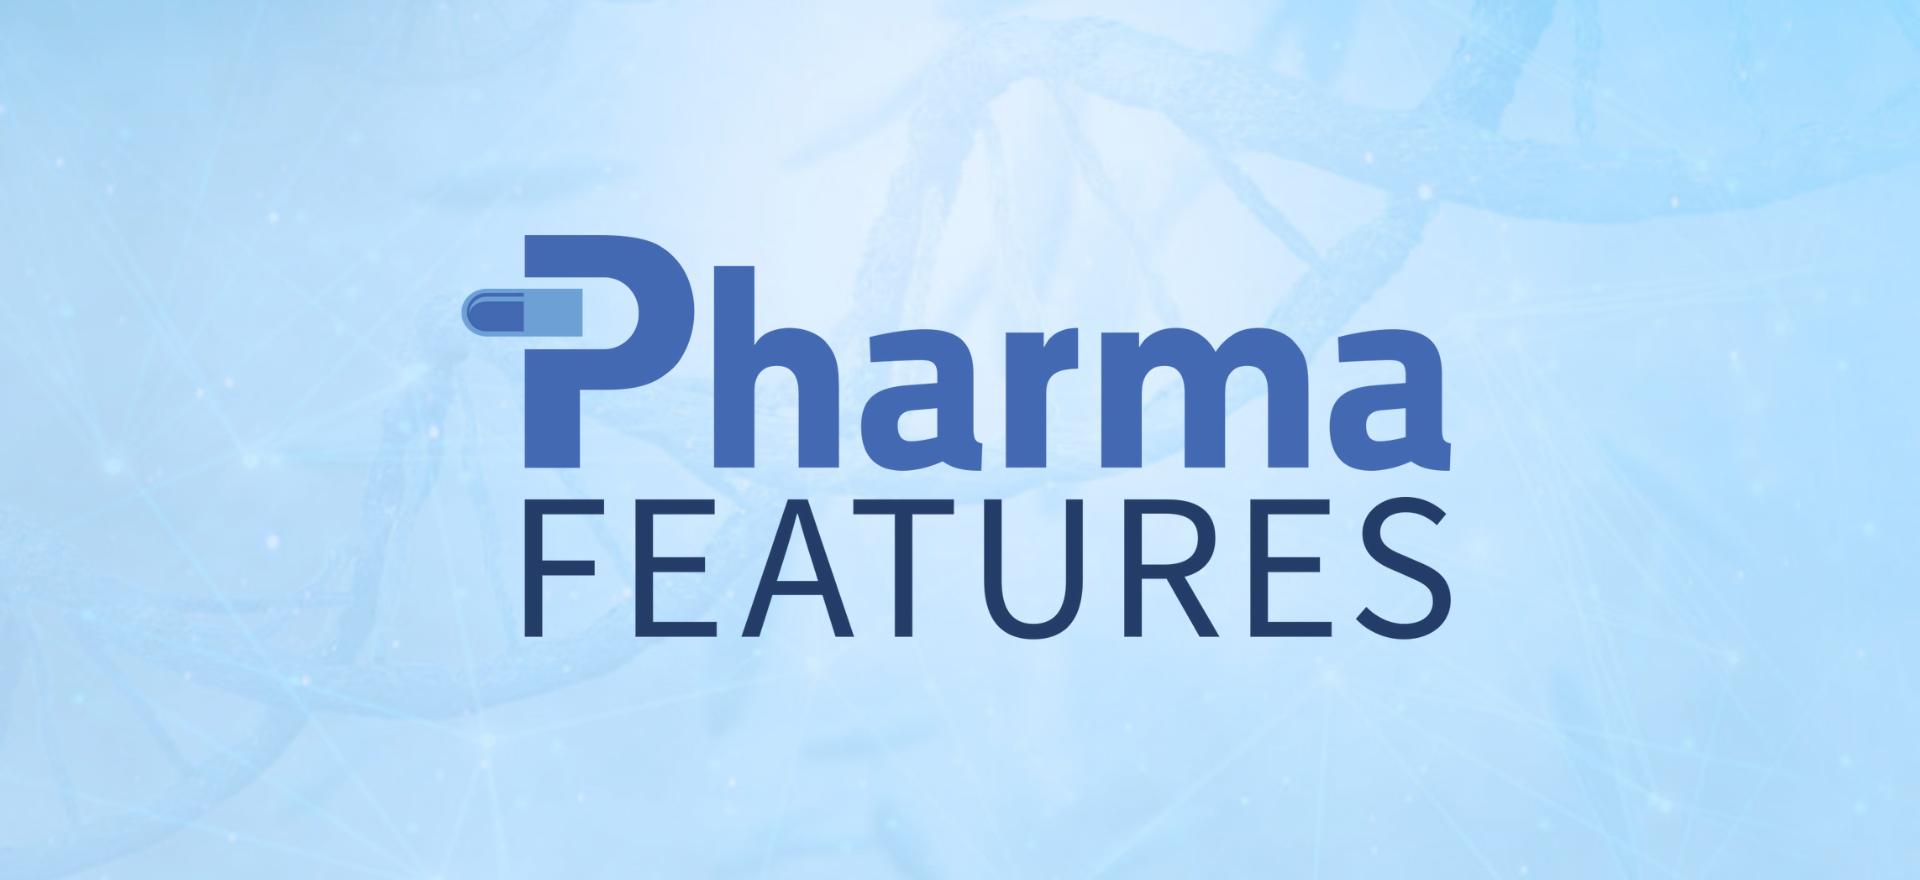 PharmaFeatures